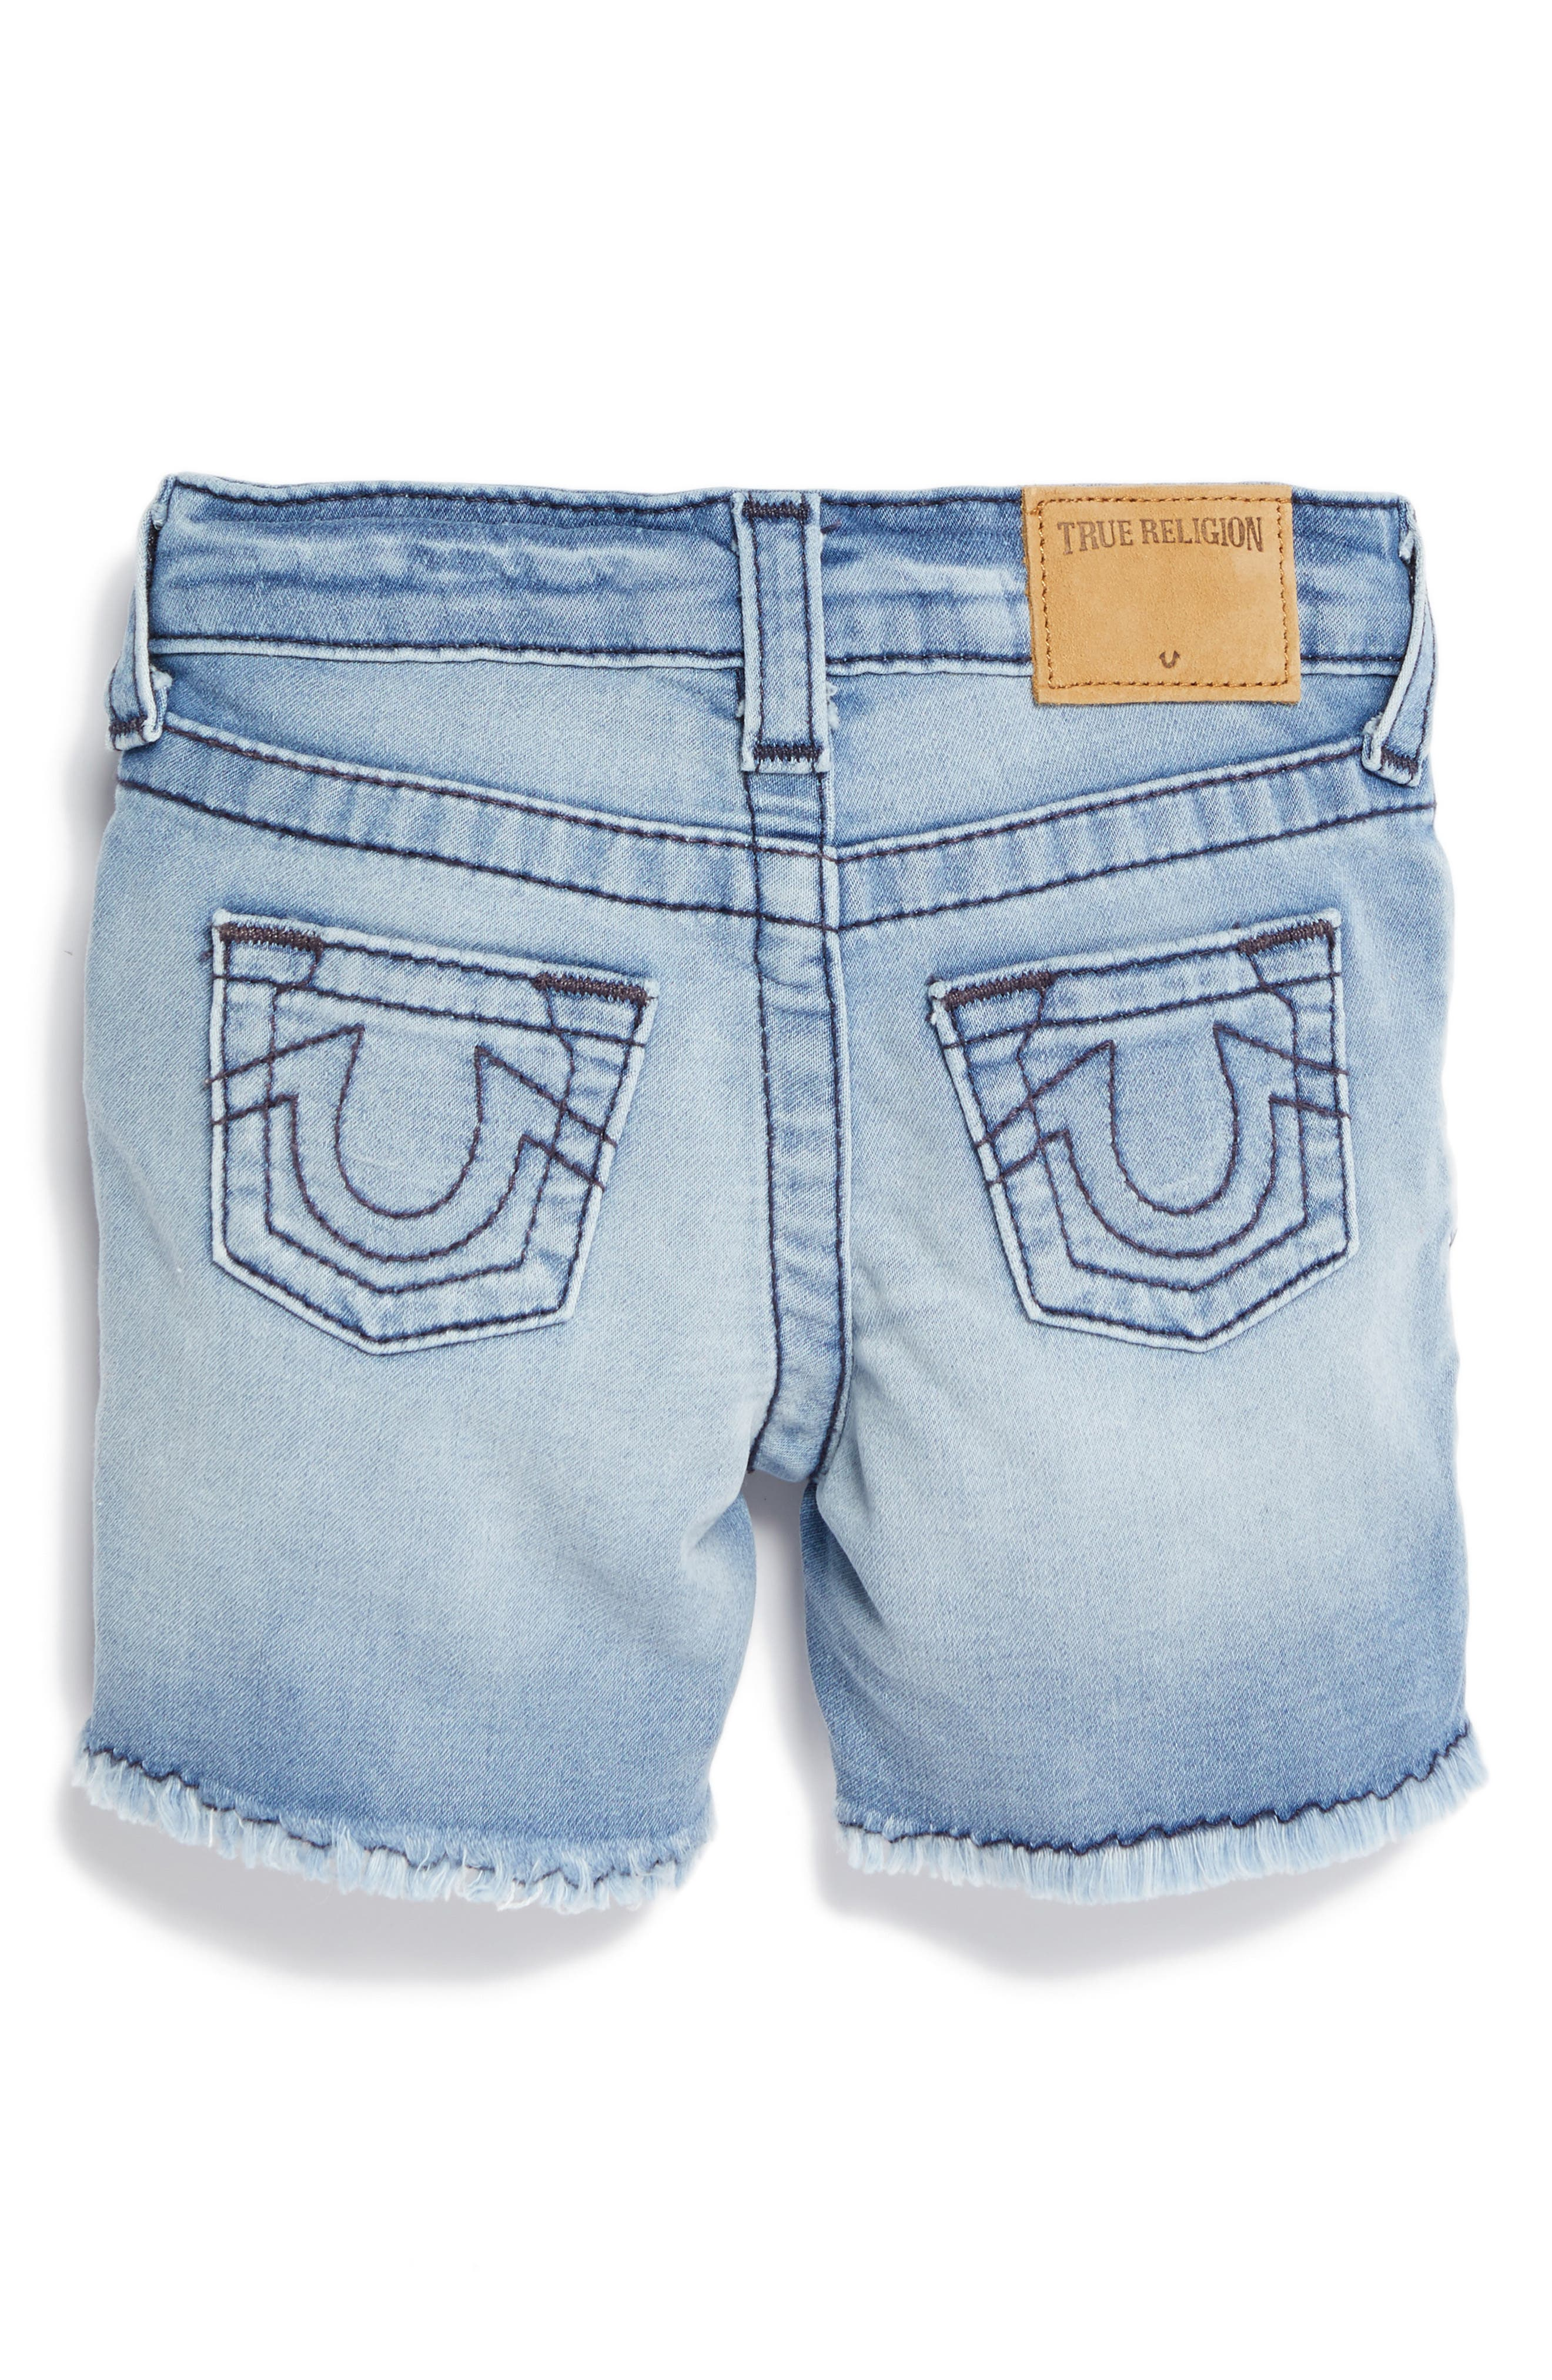 True Religion Geno Denim Shorts,                         Main,                         color, 462